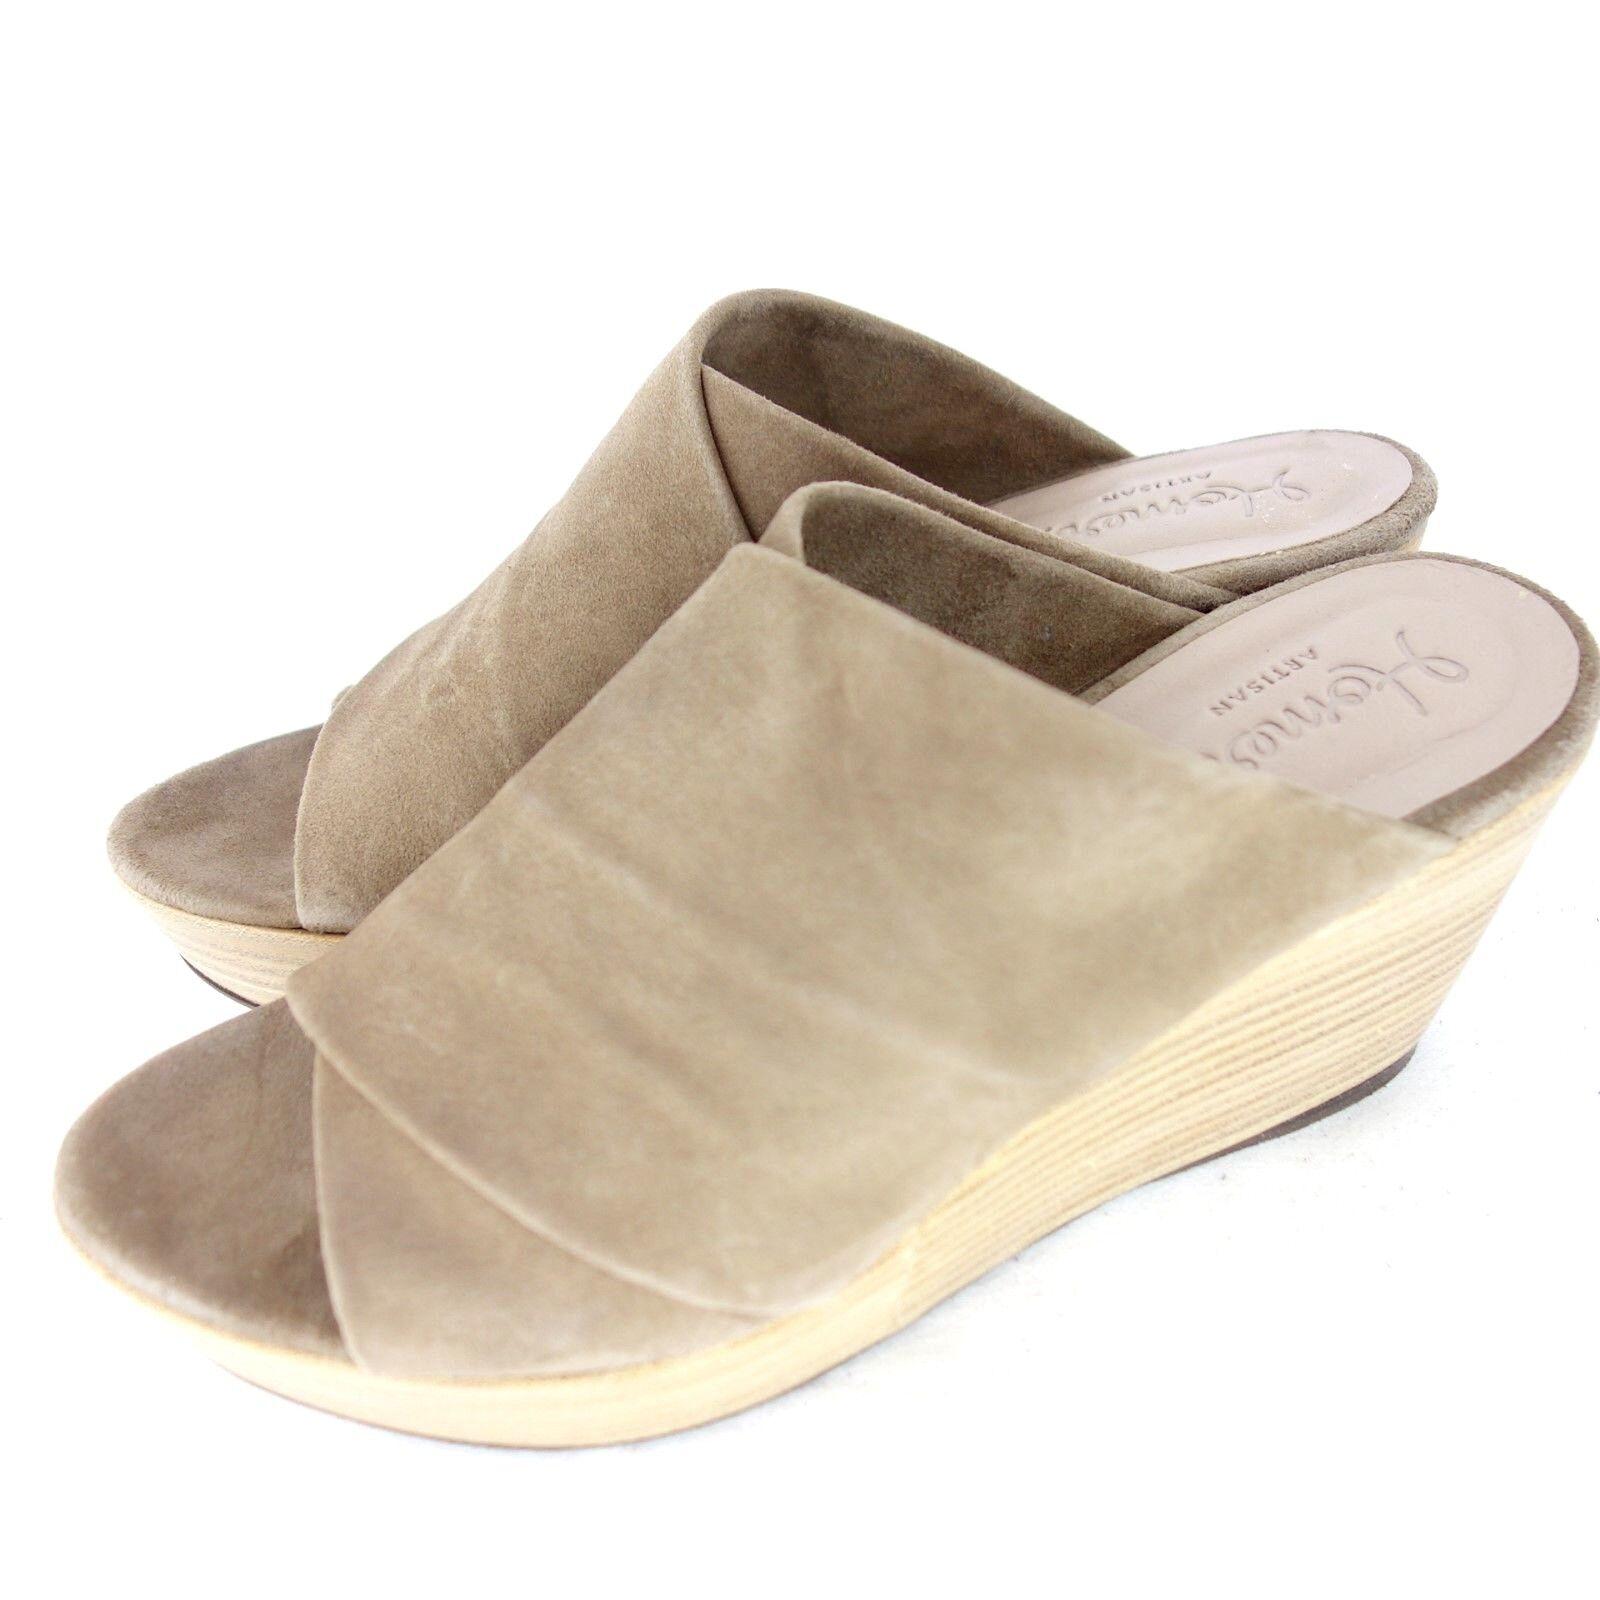 Homers donne sandali cunei calzature pelle di  pelle con np 235 nuovo  moda classica